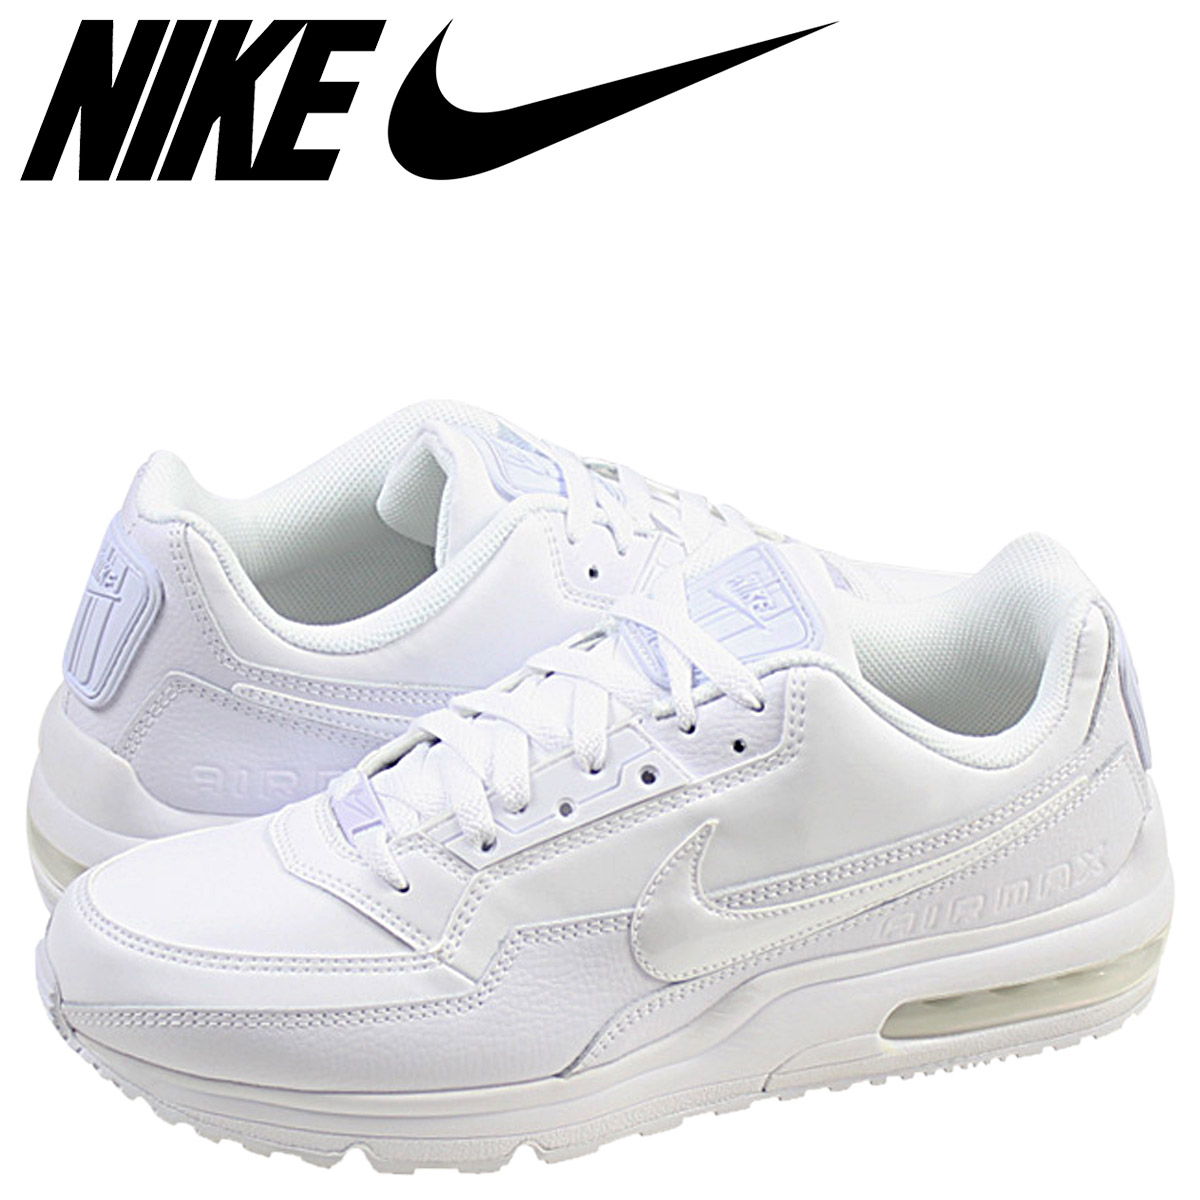 new style 0d011 2daaf Whats up Sports NIKE Nike Air Max sneakers AIR MAX LTD 3 Air Max Ltd  687977-111 mens shoe white  Rakuten Global Market